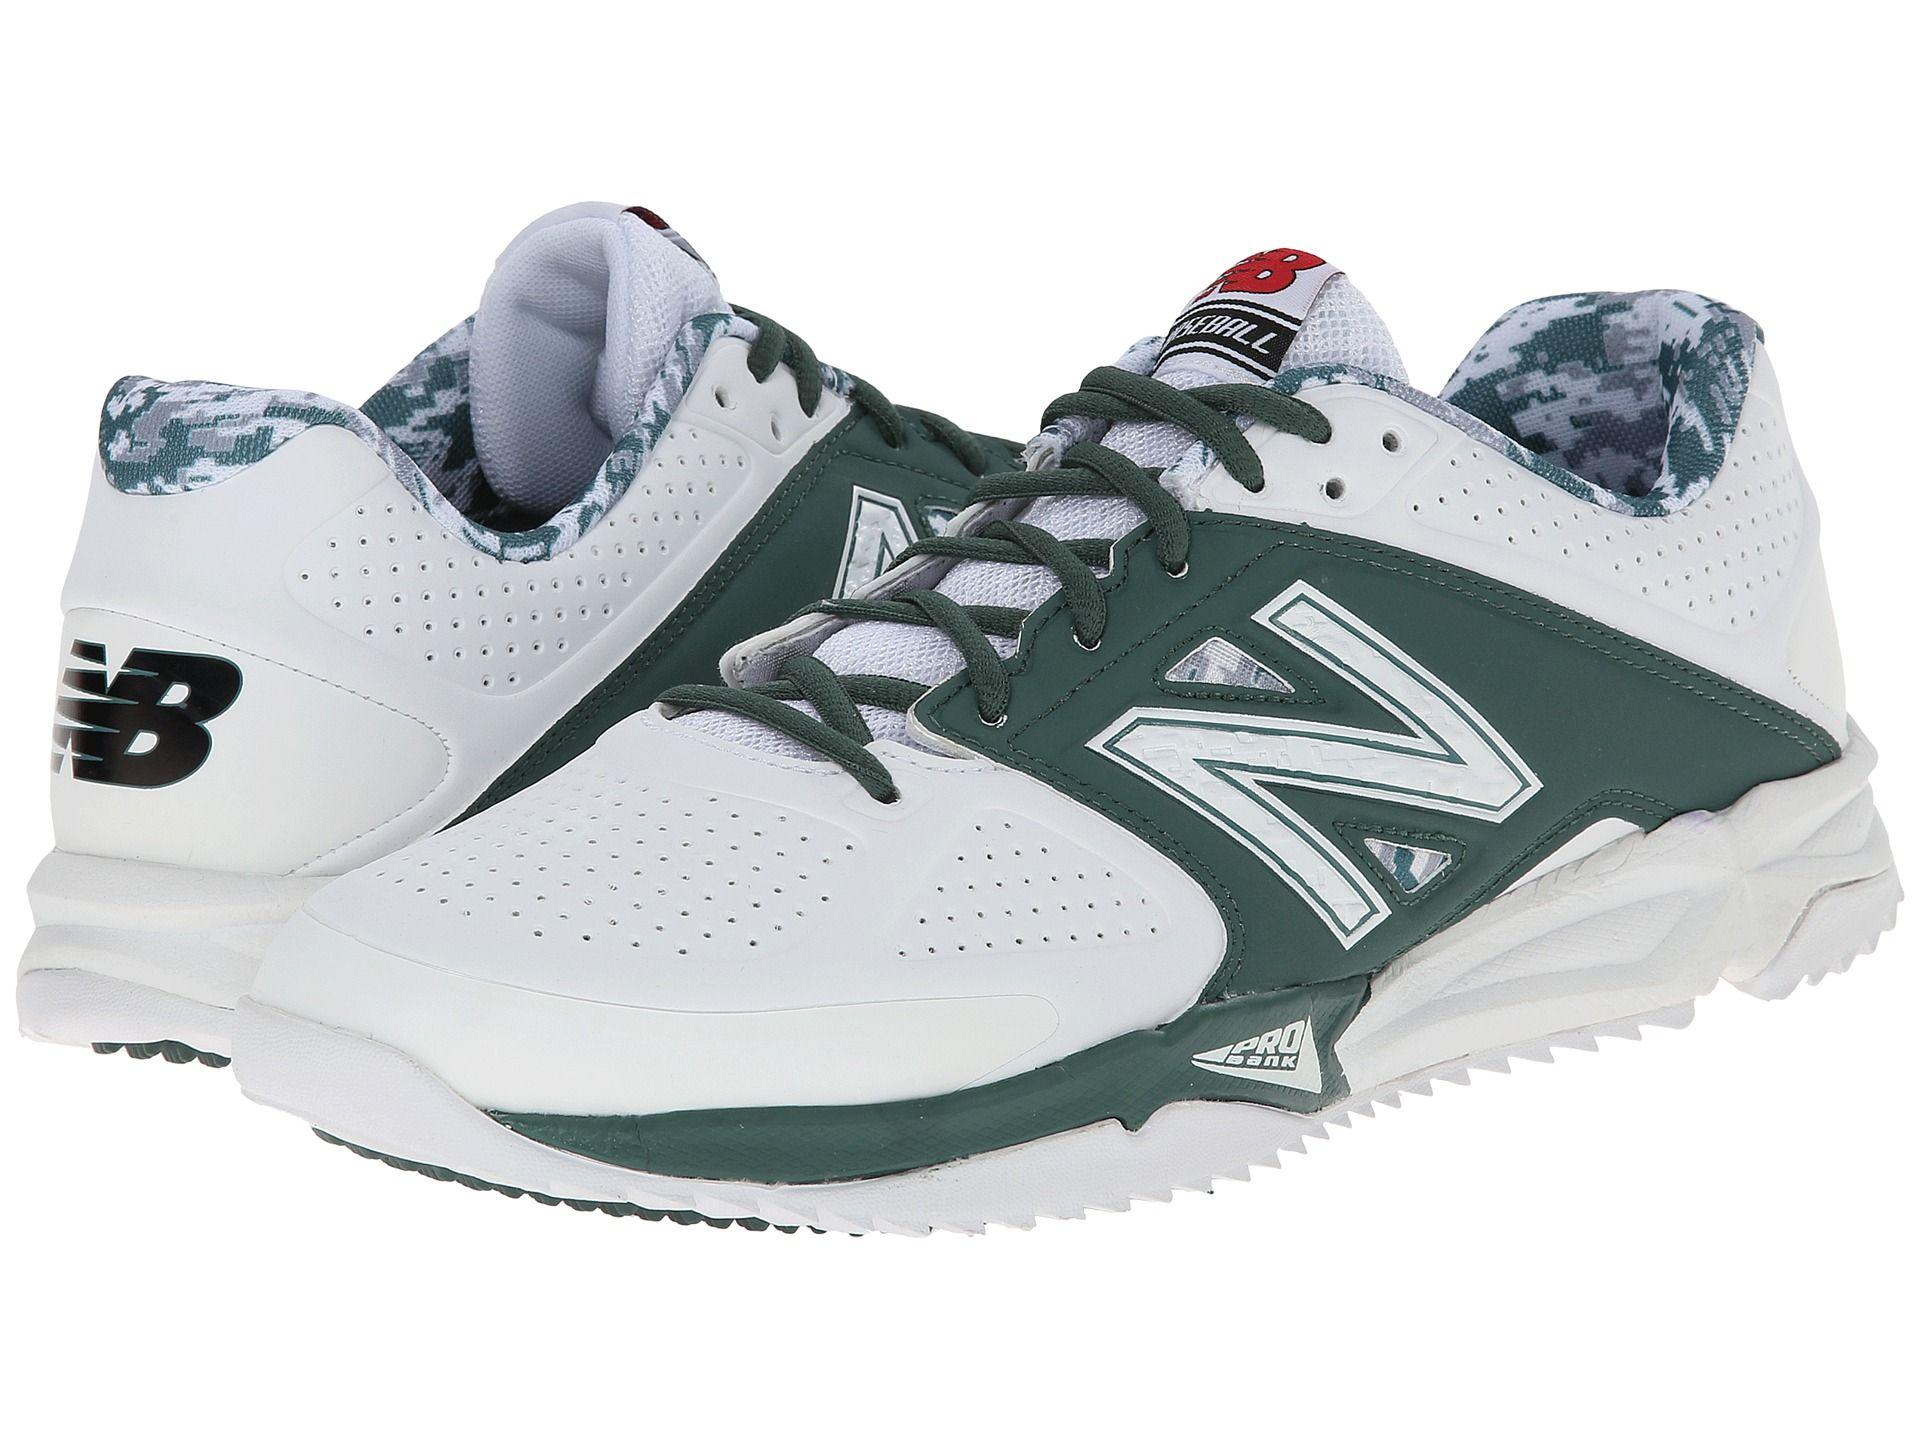 New Balance 4040v2 Turf - Men\u0027s - Grey/Black | dope kicks | Pinterest |  Baseball gear, Cleats and Tennis